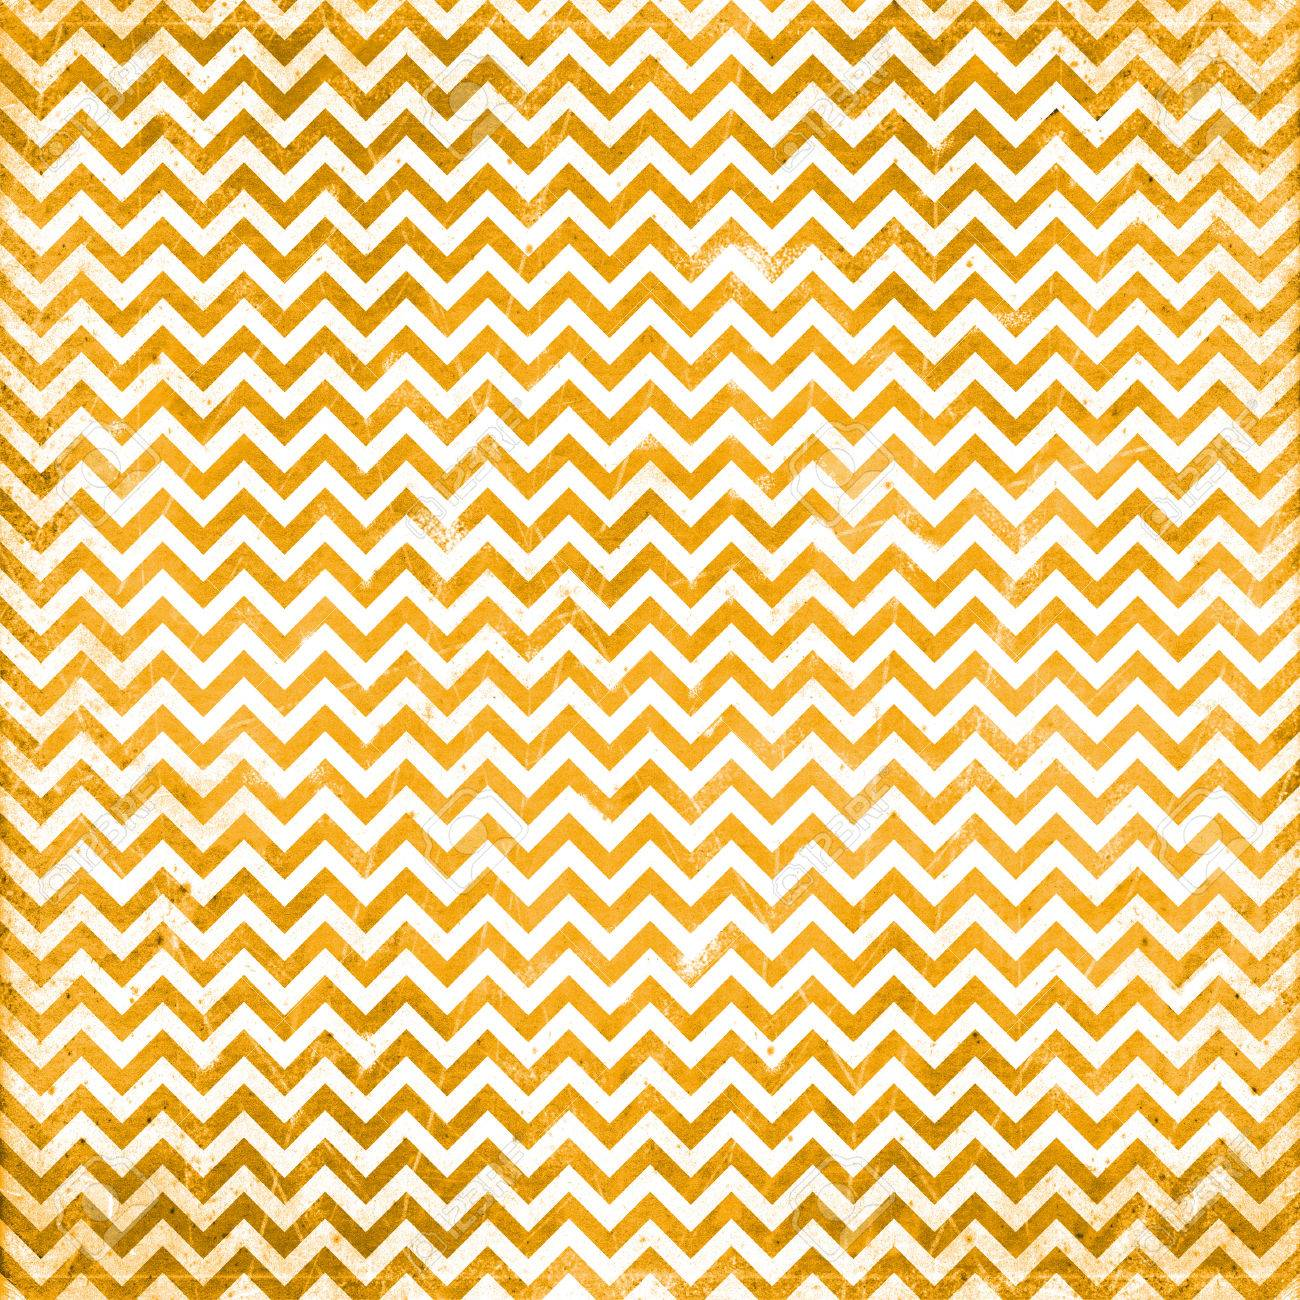 orange chevron pattern Stock Photo - 23127324